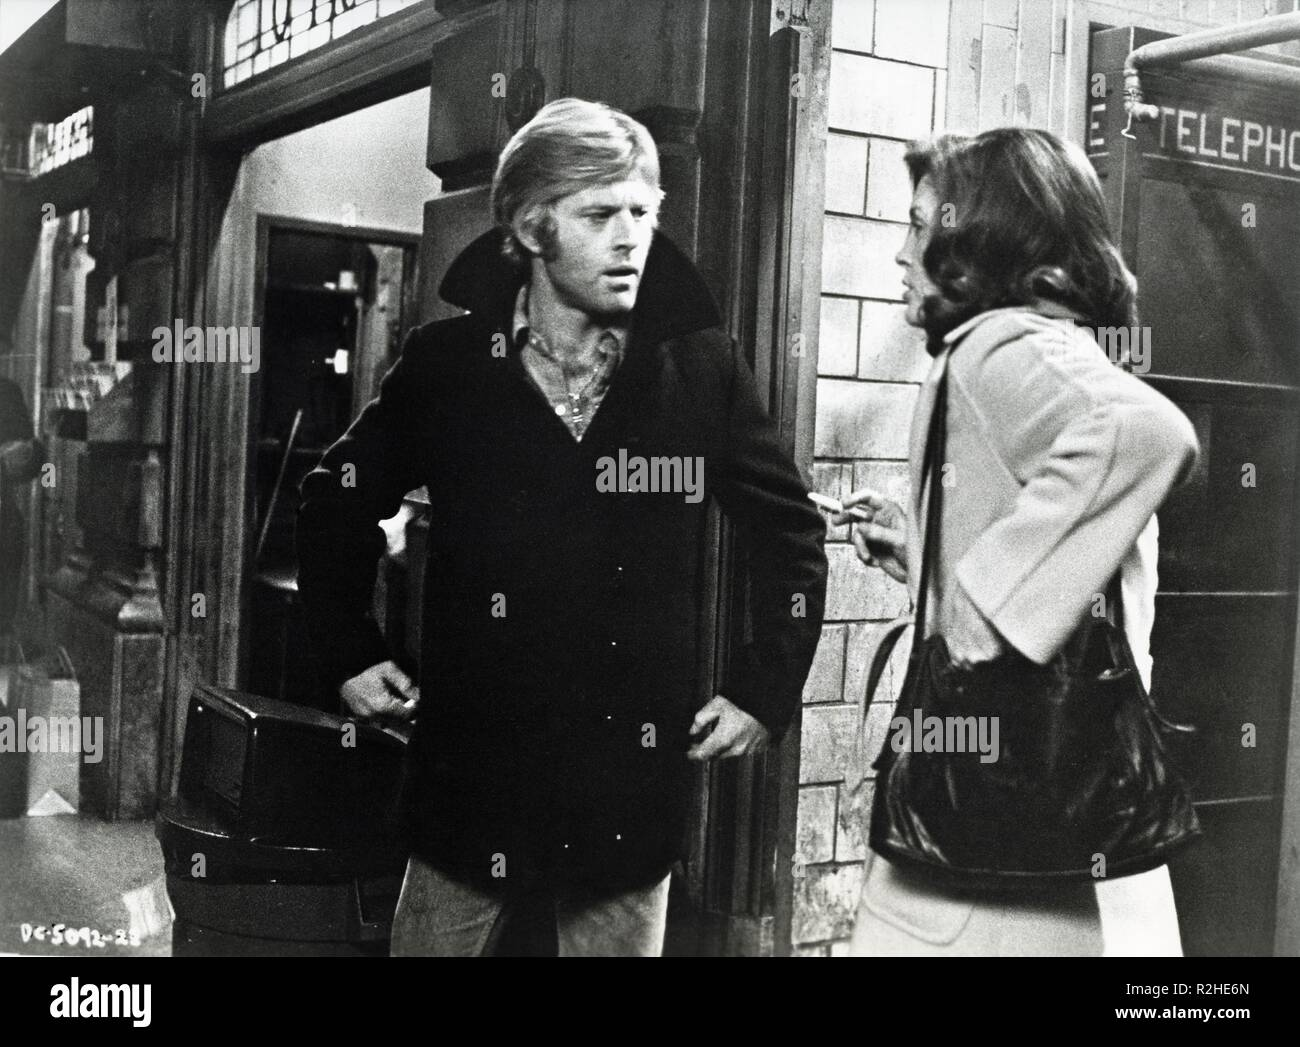 Three Days of the Condor  Year : 1975 USA Director : Sydney Pollack Robert Redford, Faye Dunaway - Stock Image